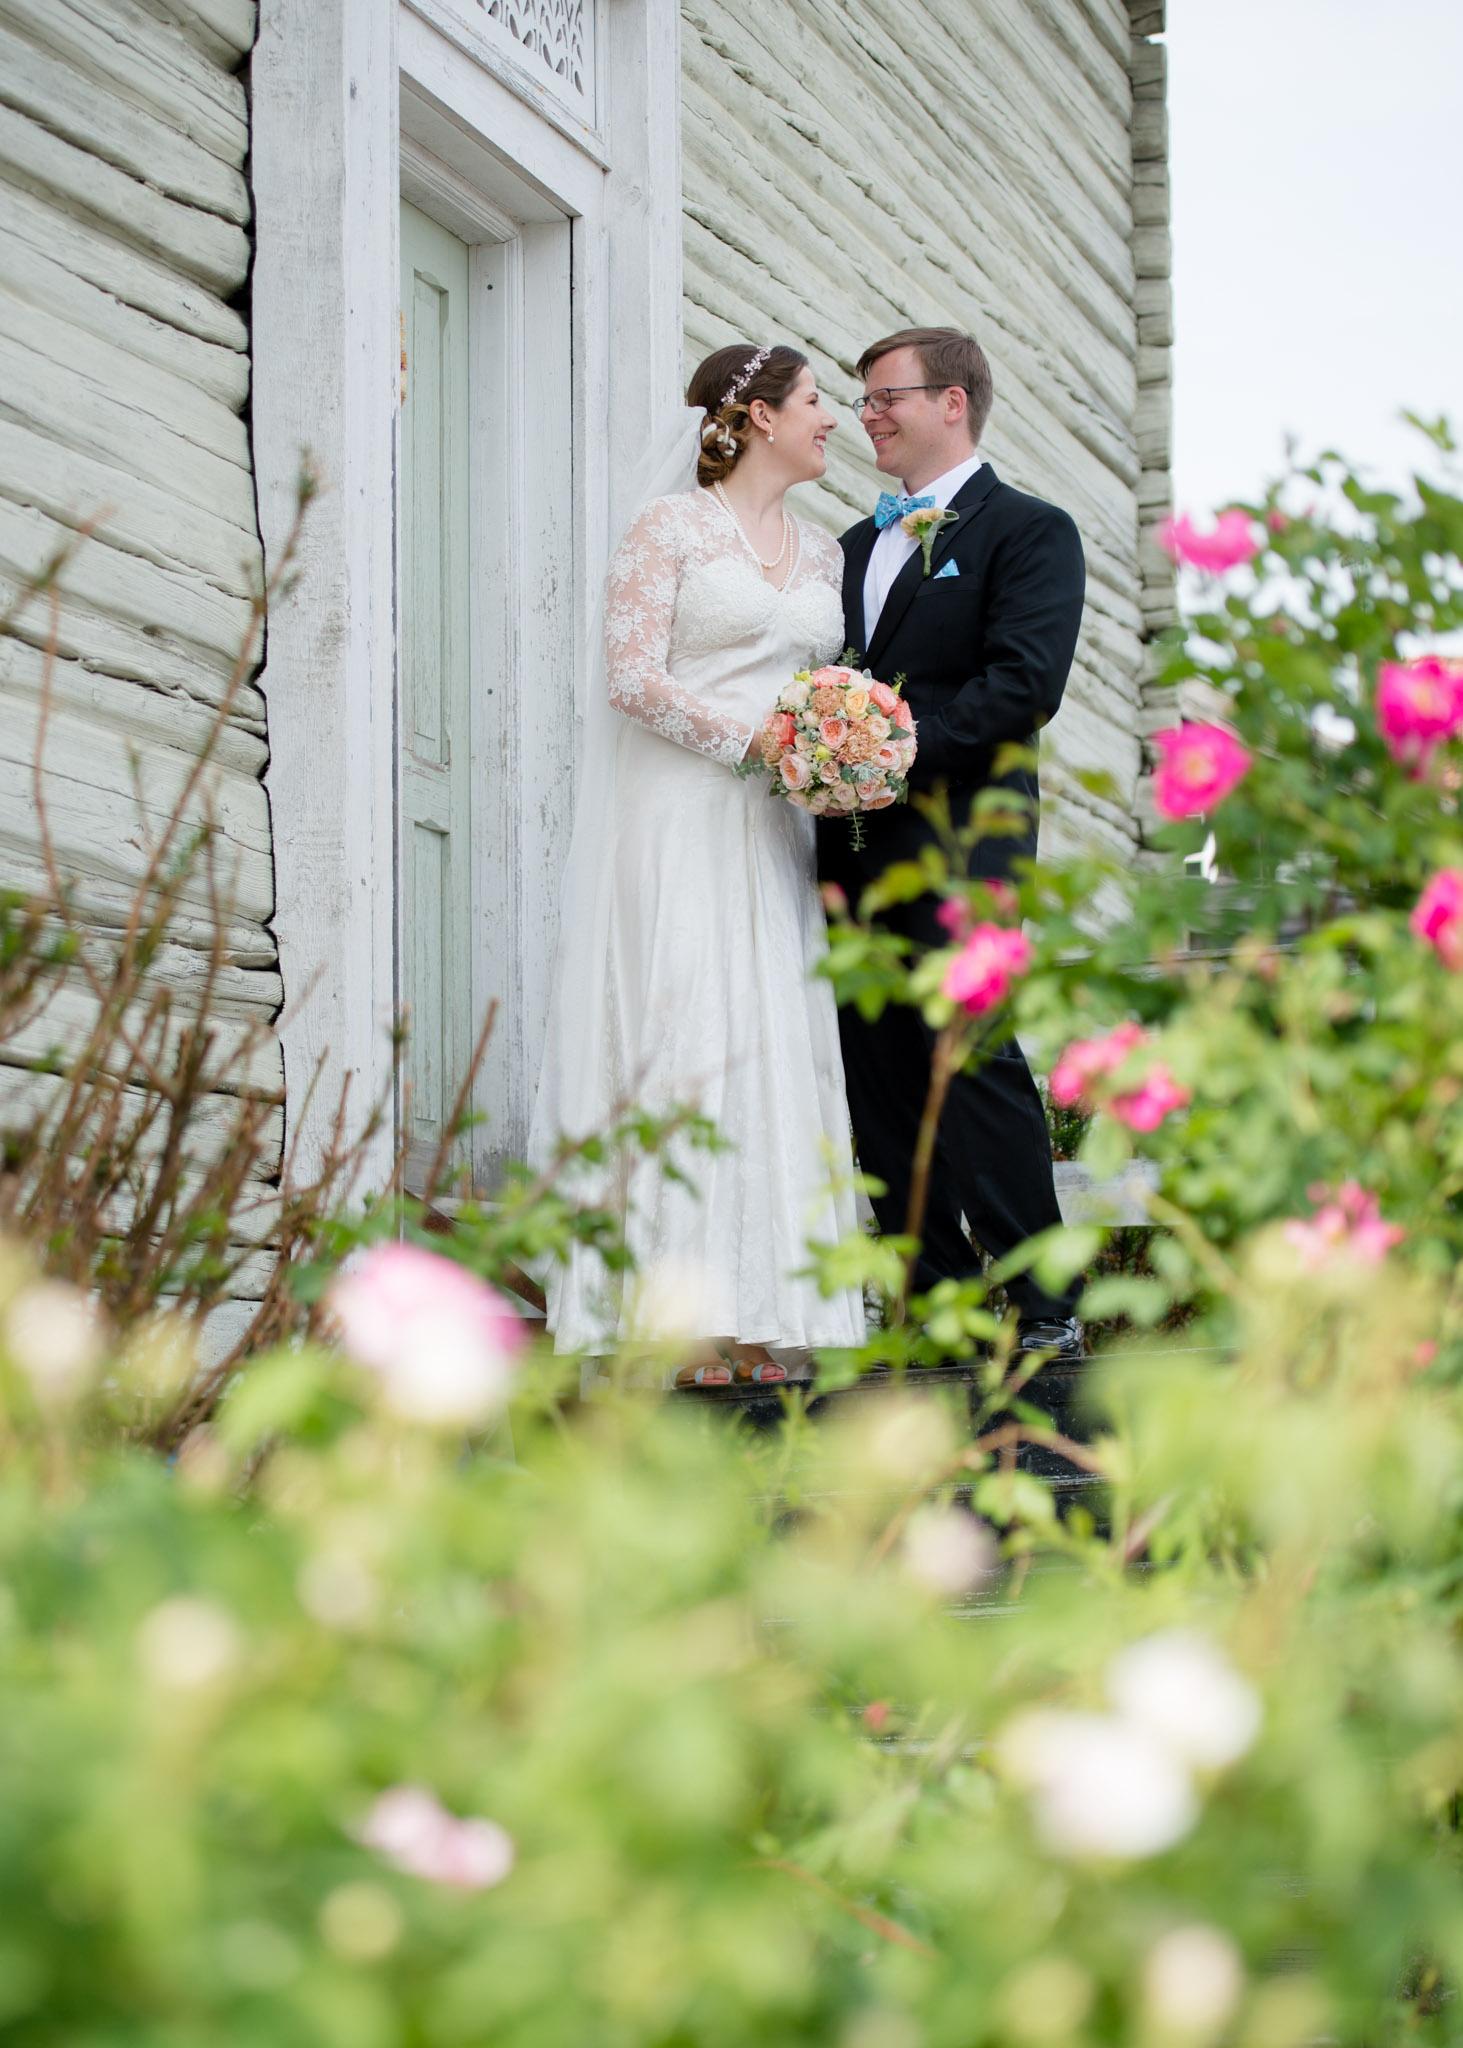 bryllupsfotograf-tønsberg-nøtterøy-fotograf-tjøme-vestfold-oslo-fotografvarpe--5902.JPG